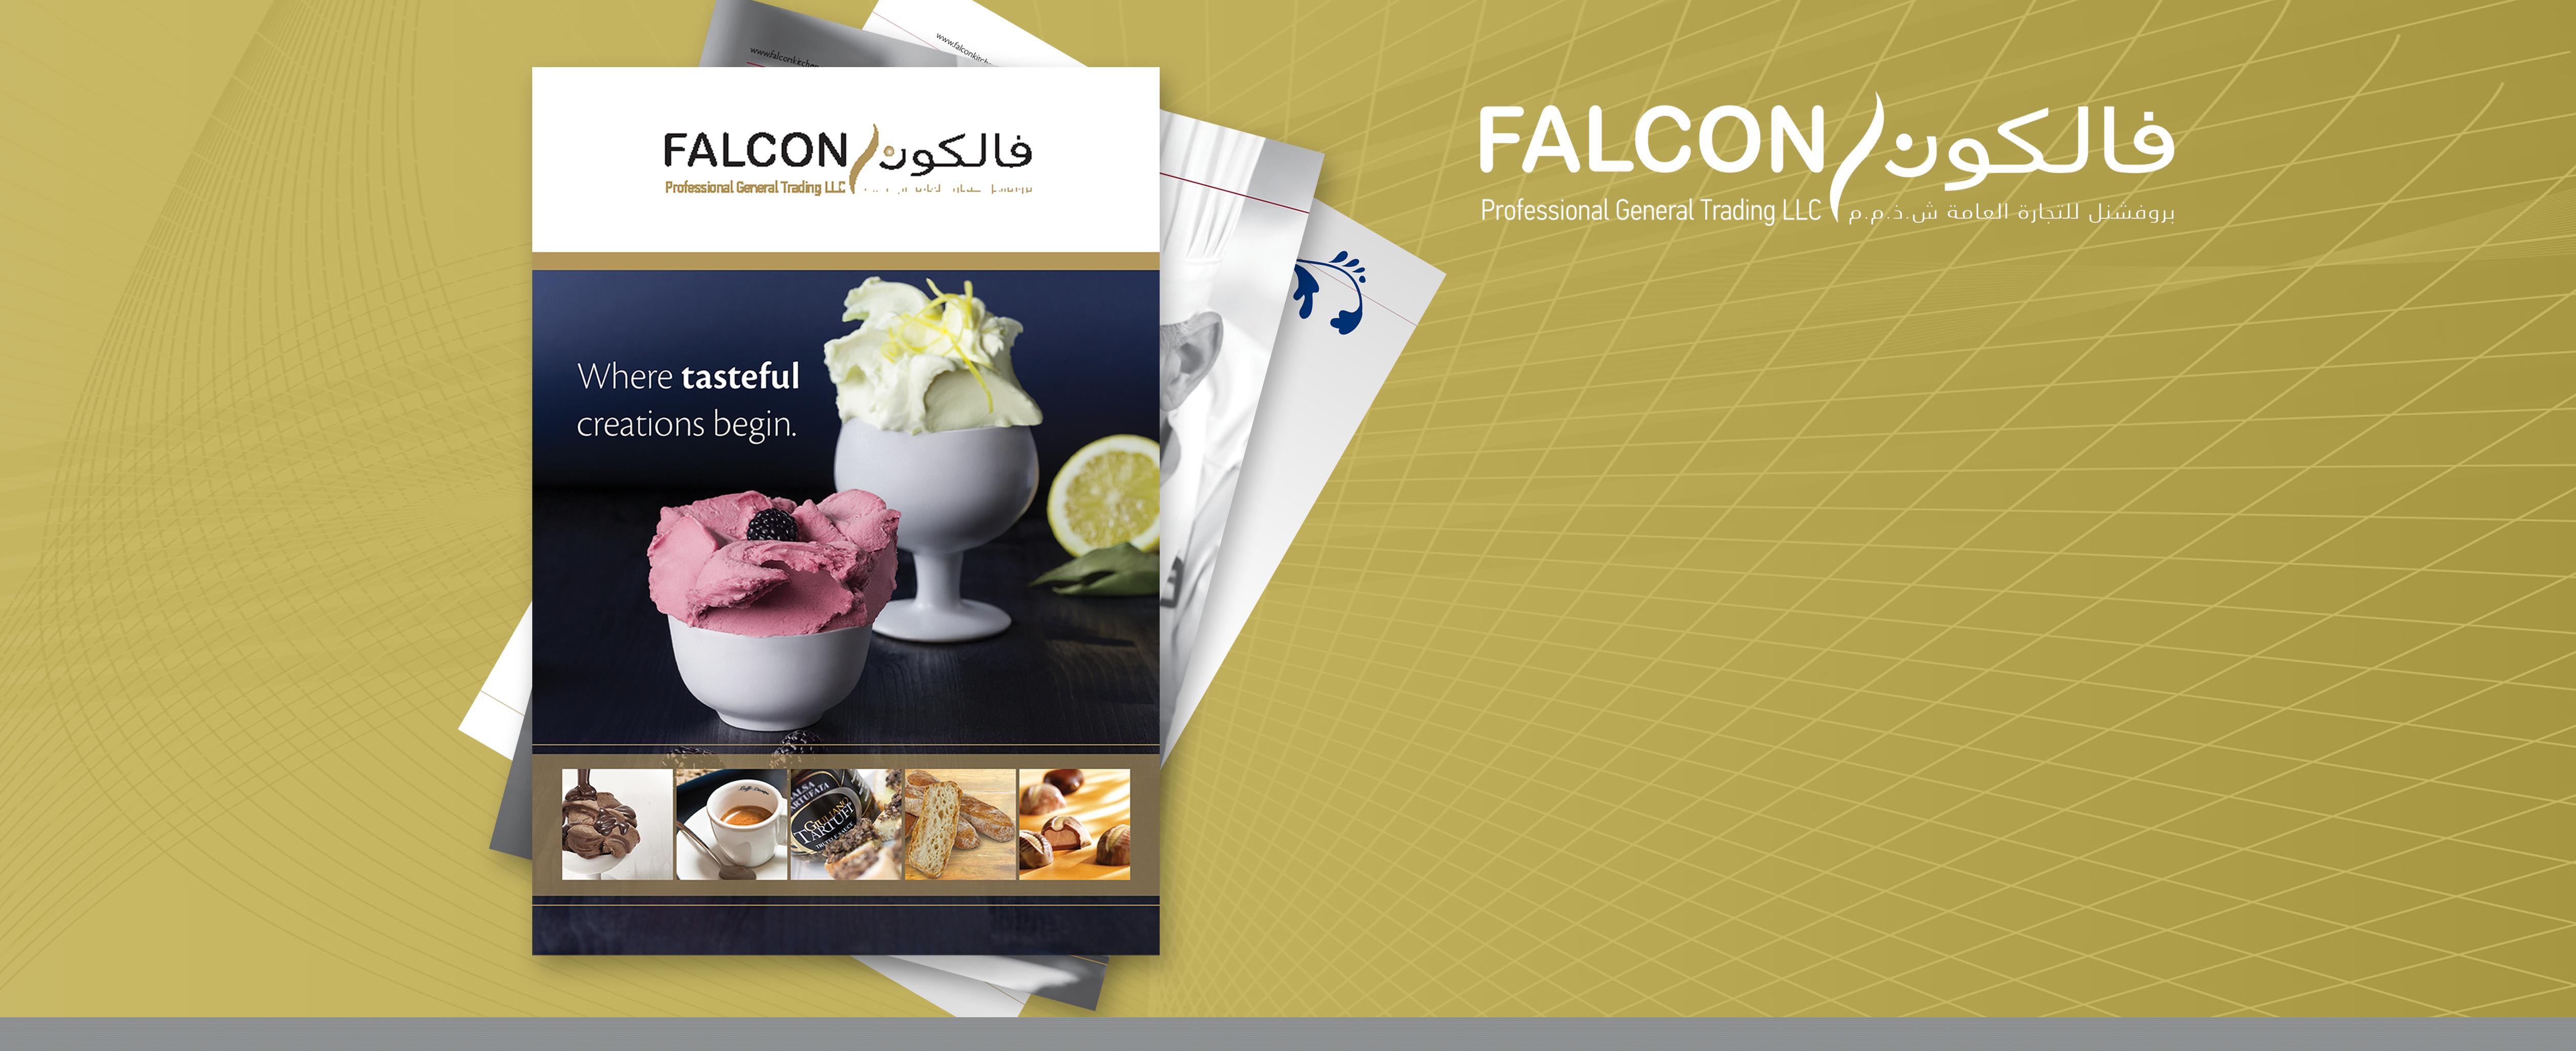 Kitchen Equipment Dubai, Stainless steel fabrication, Coffee